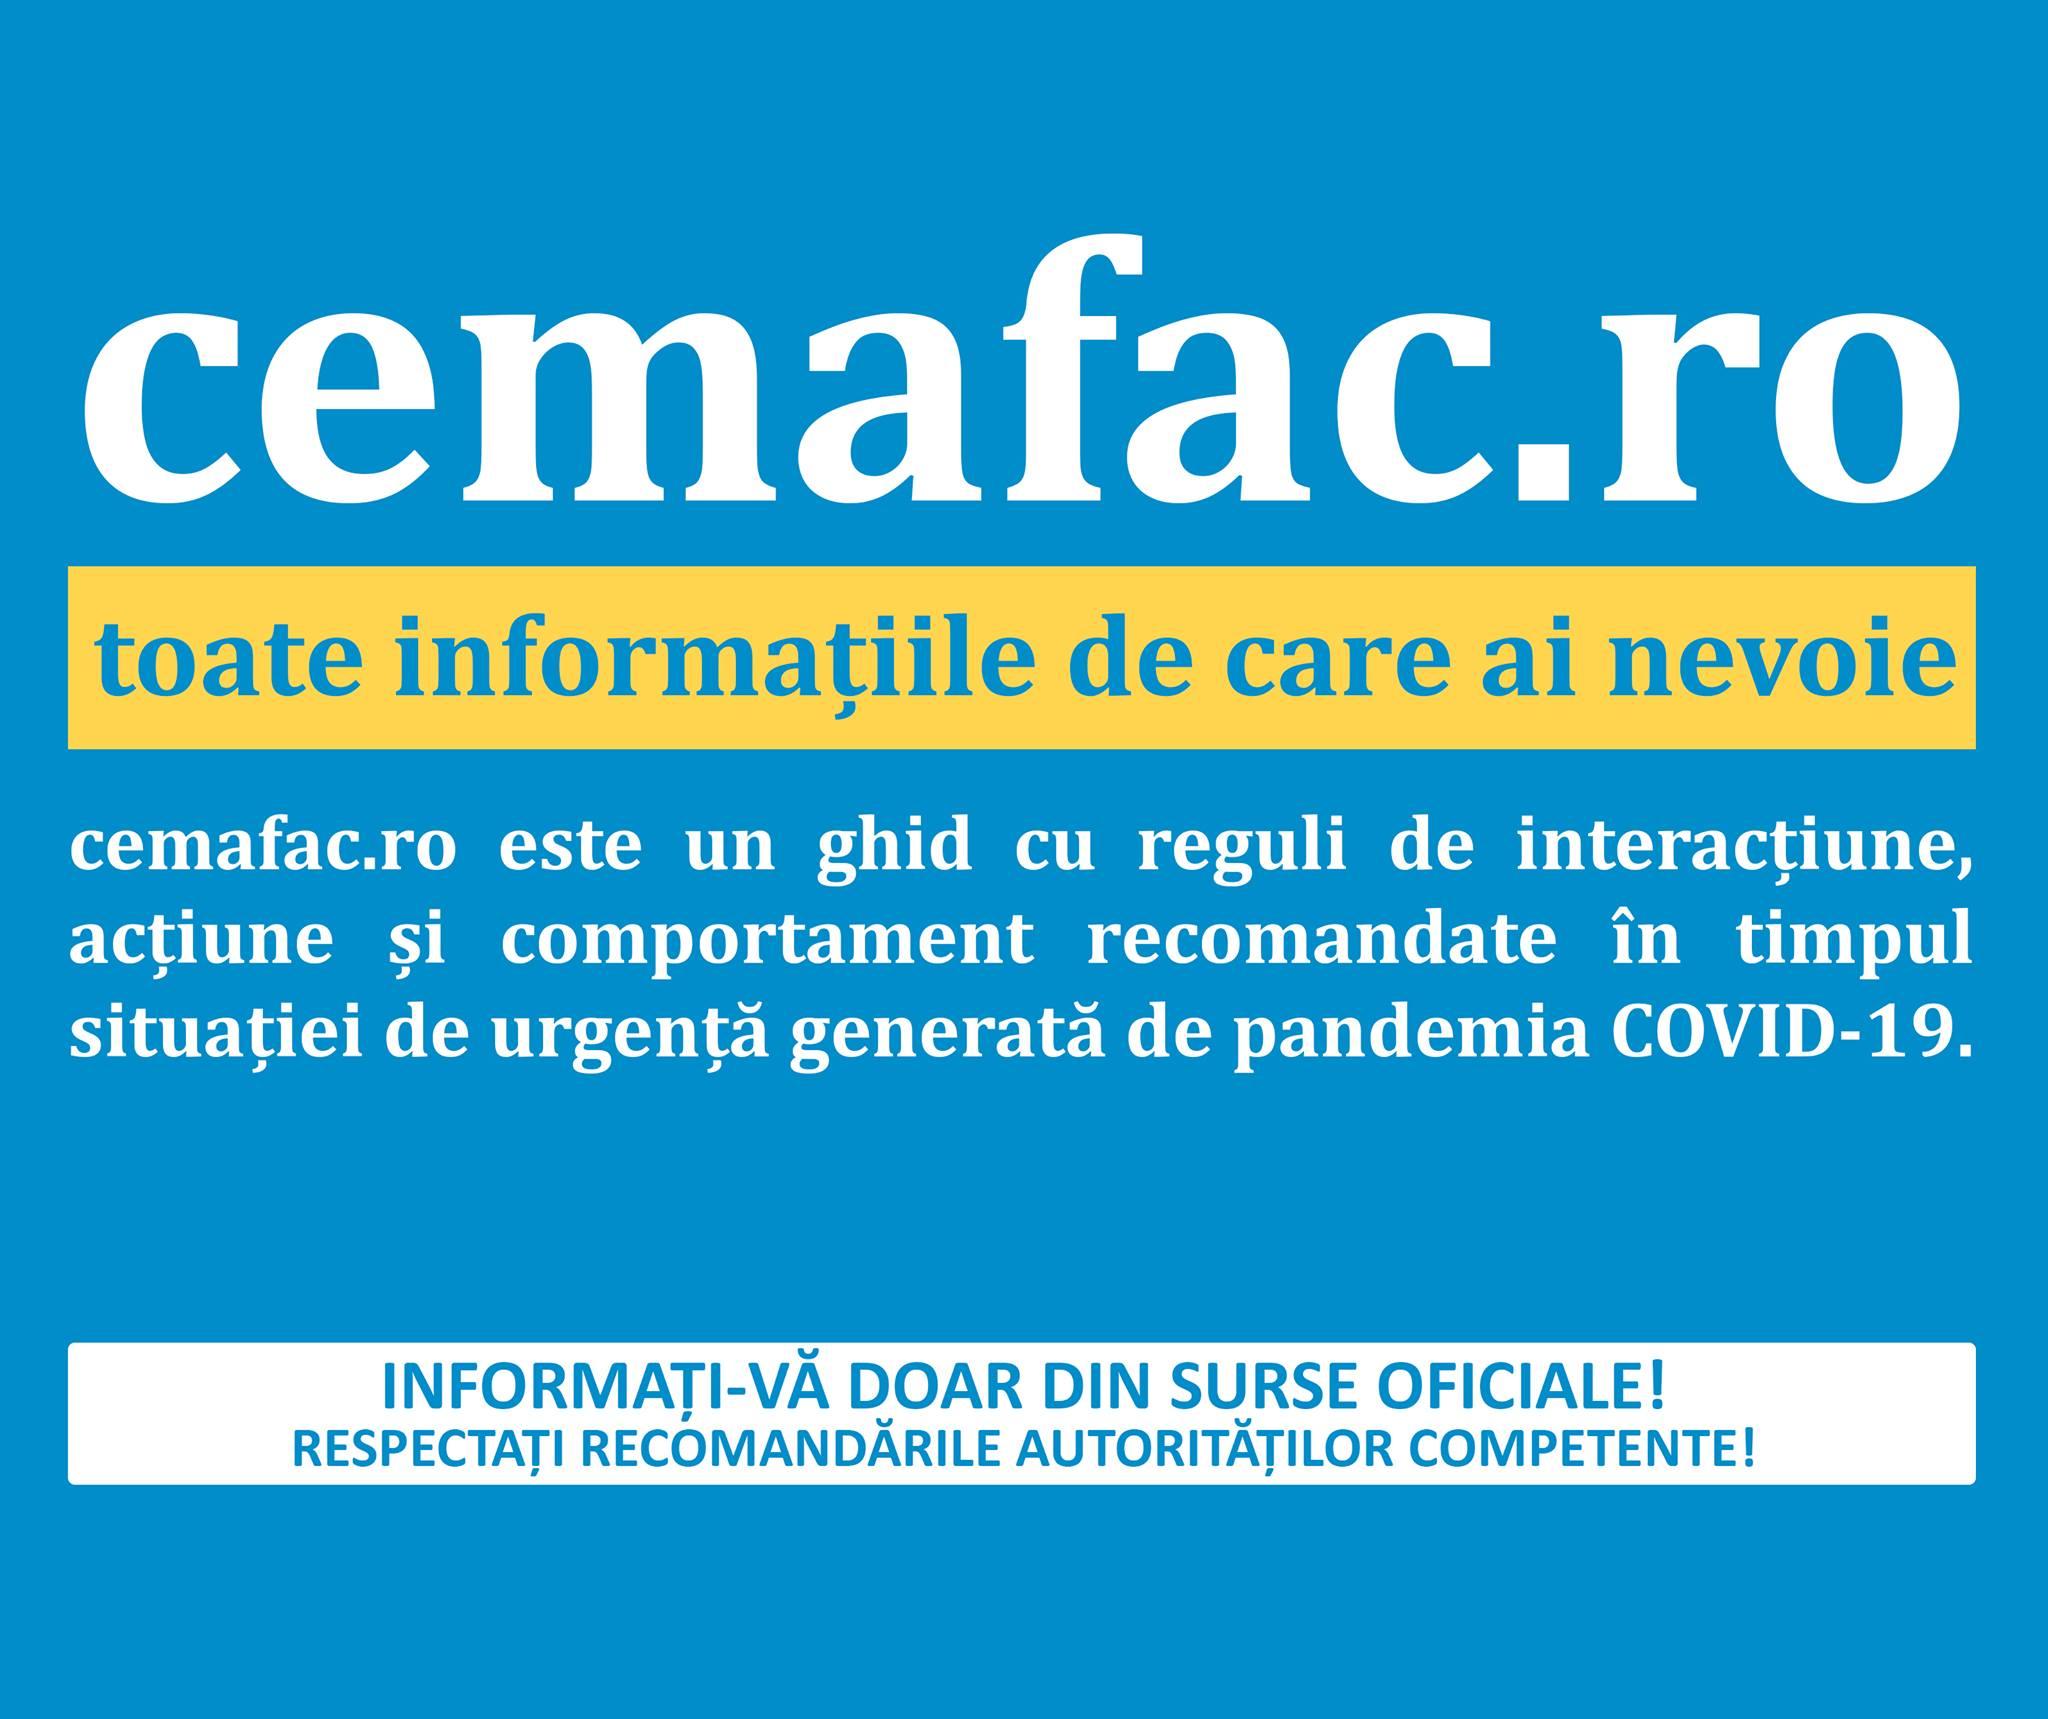 cemafac.ro